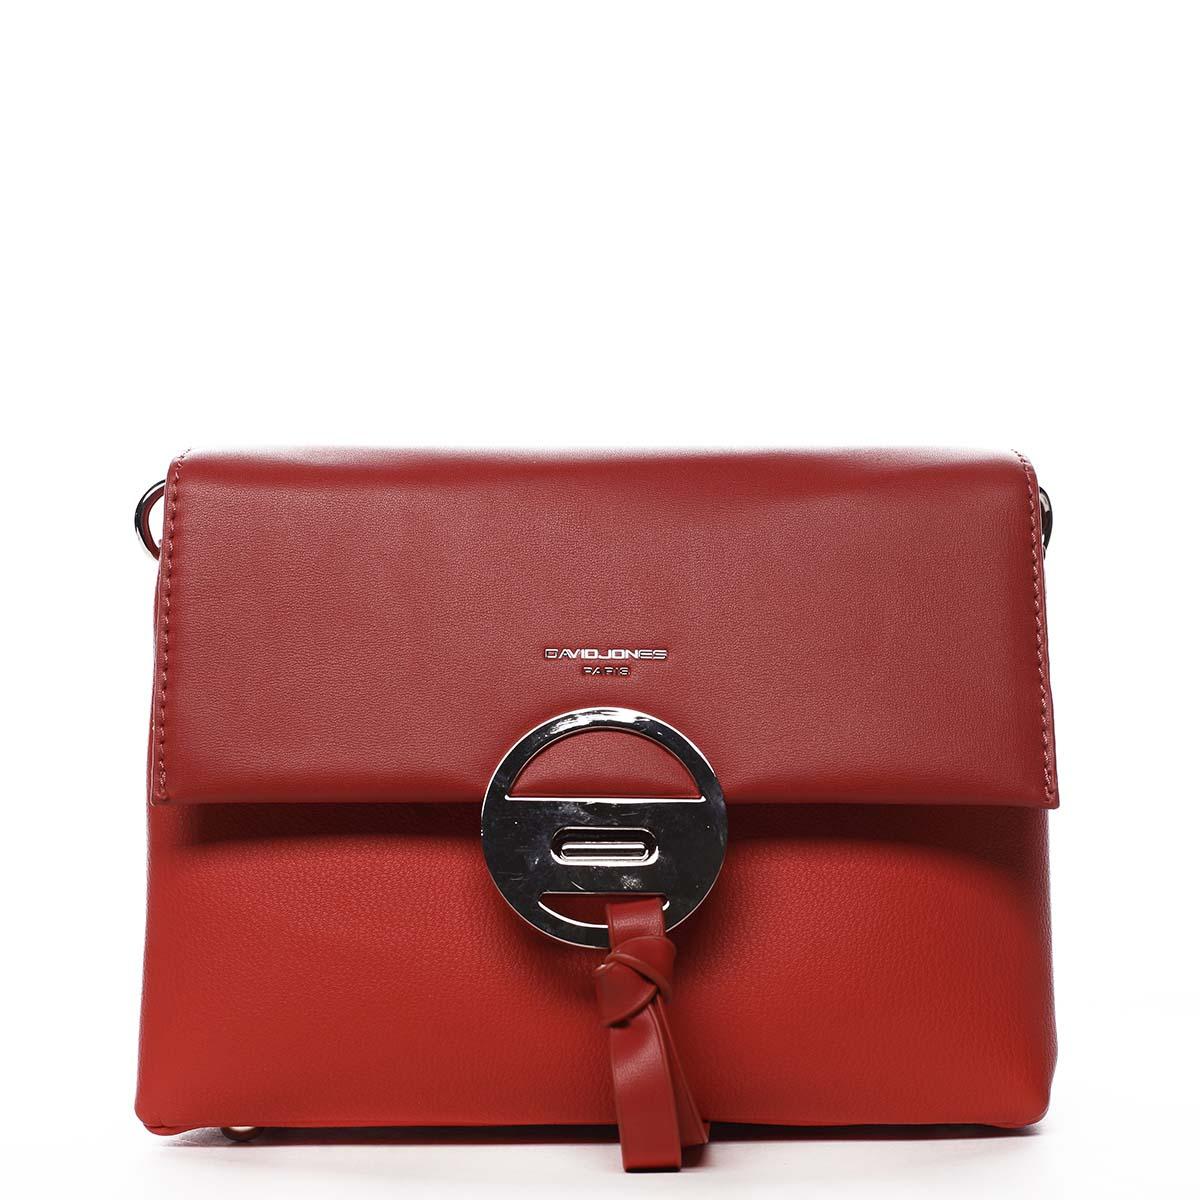 Dámská crossbody kabelka červená - David Jones Afiinisha